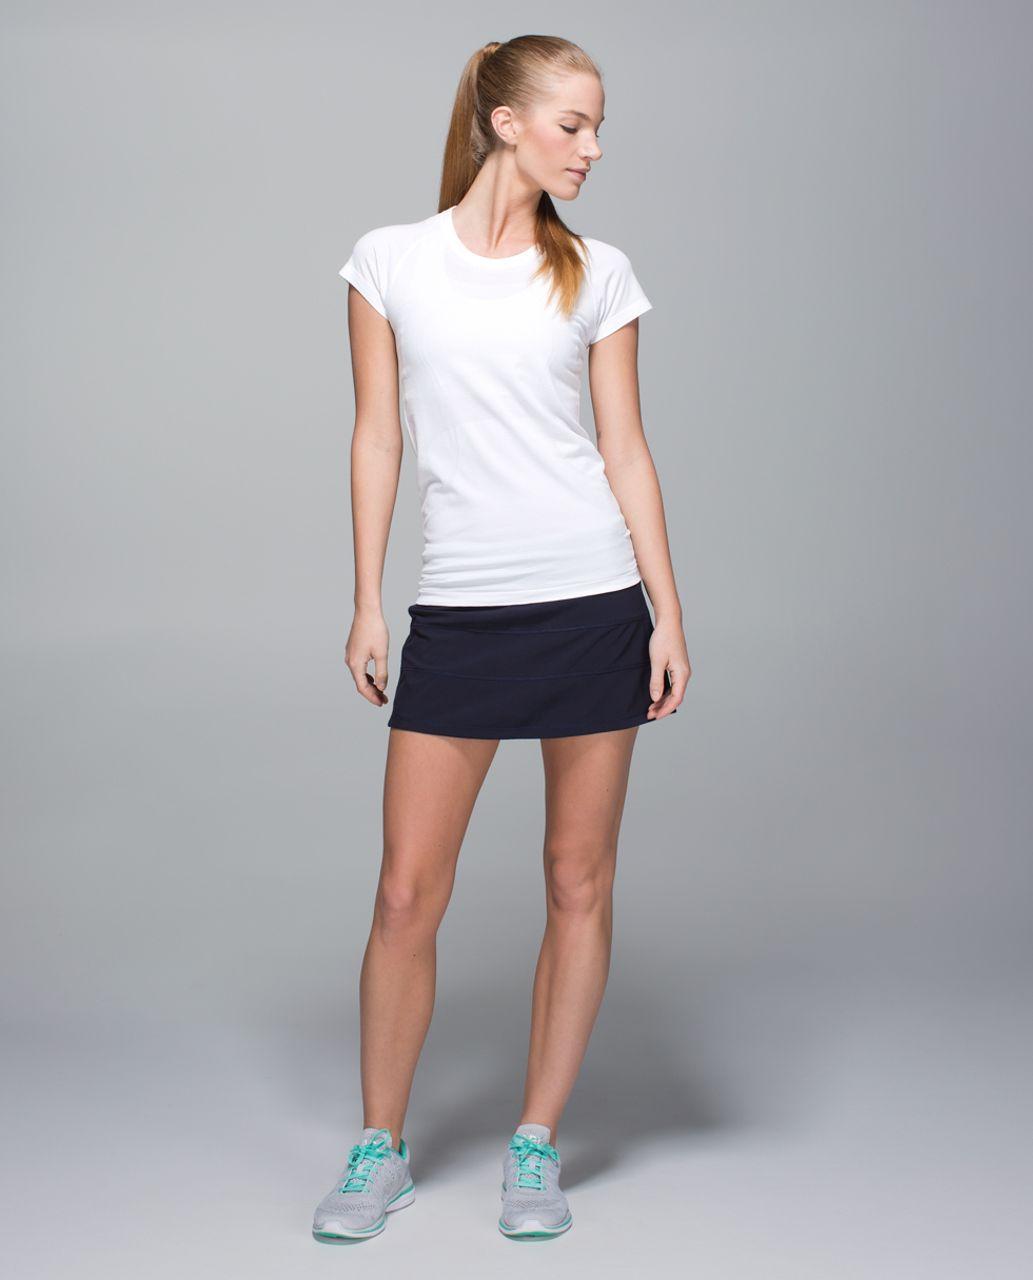 Lululemon Pace Rival Skirt II *4-way Stretch (Regular) - Naval Blue